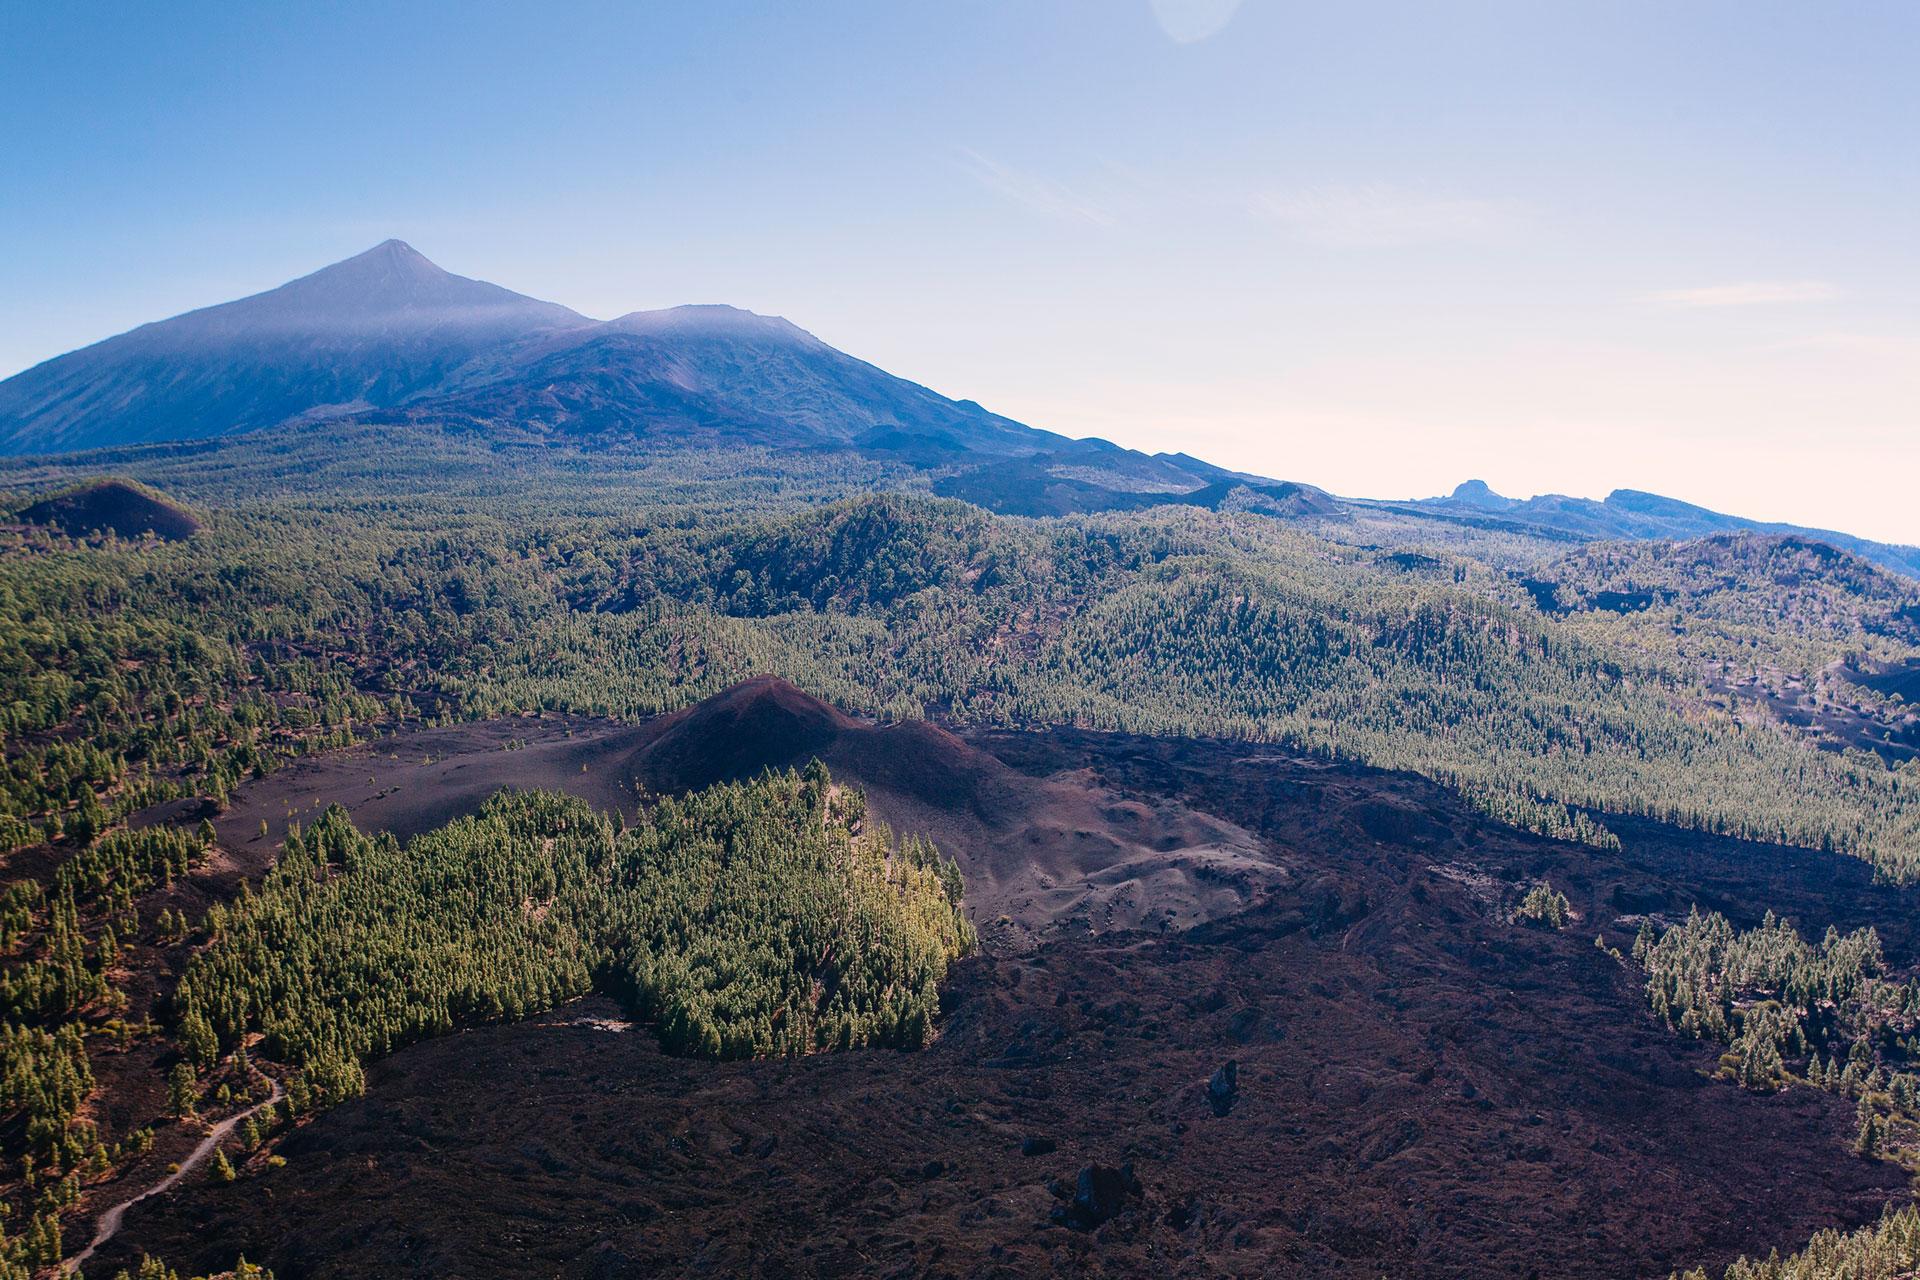 helicoptero_036_chinyero_teide_volcanes_territorio_antiguo_alta